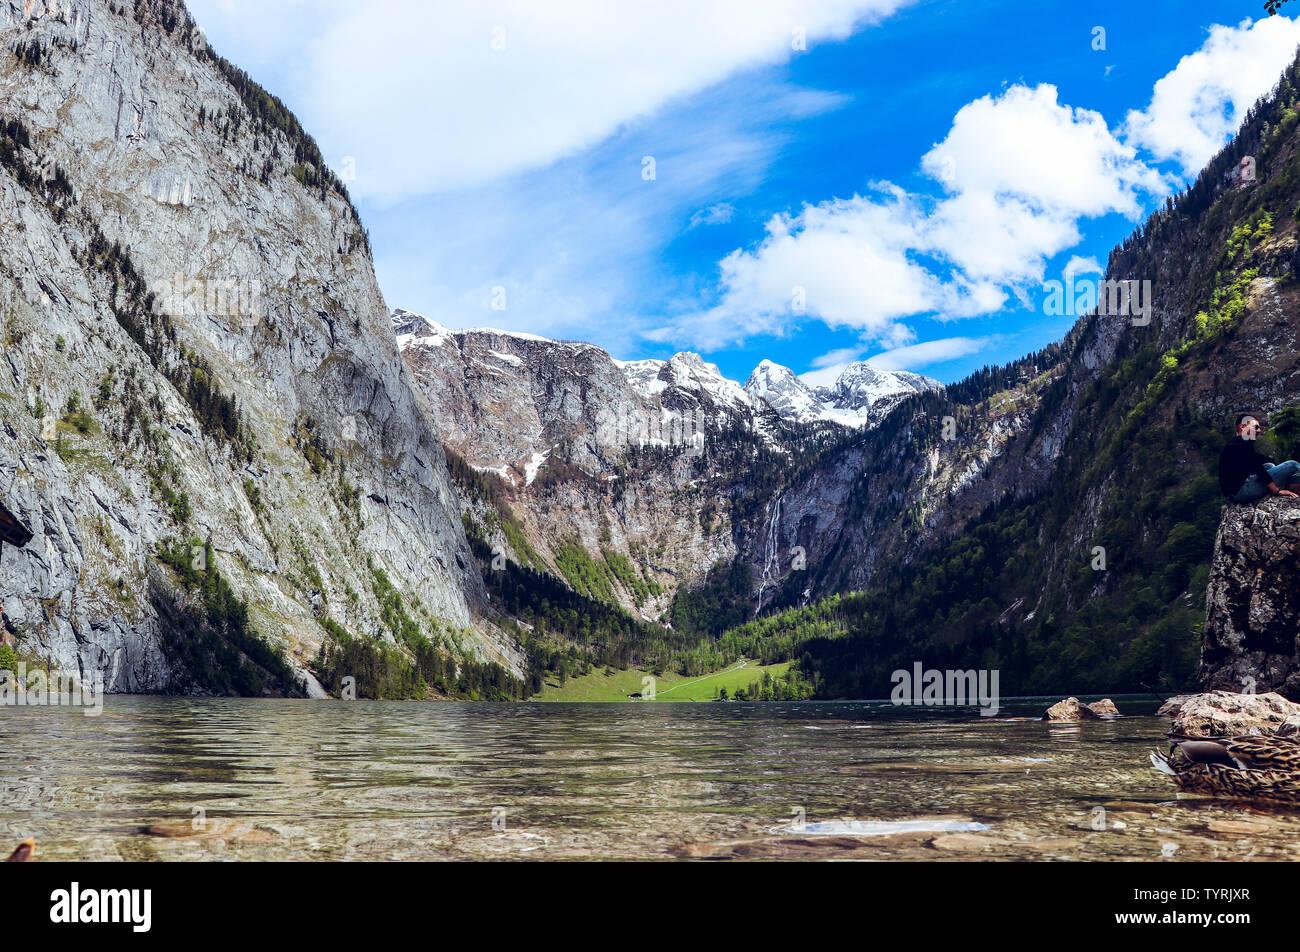 Lake Konigsee High Resolution Stock Photography And Images Alamy